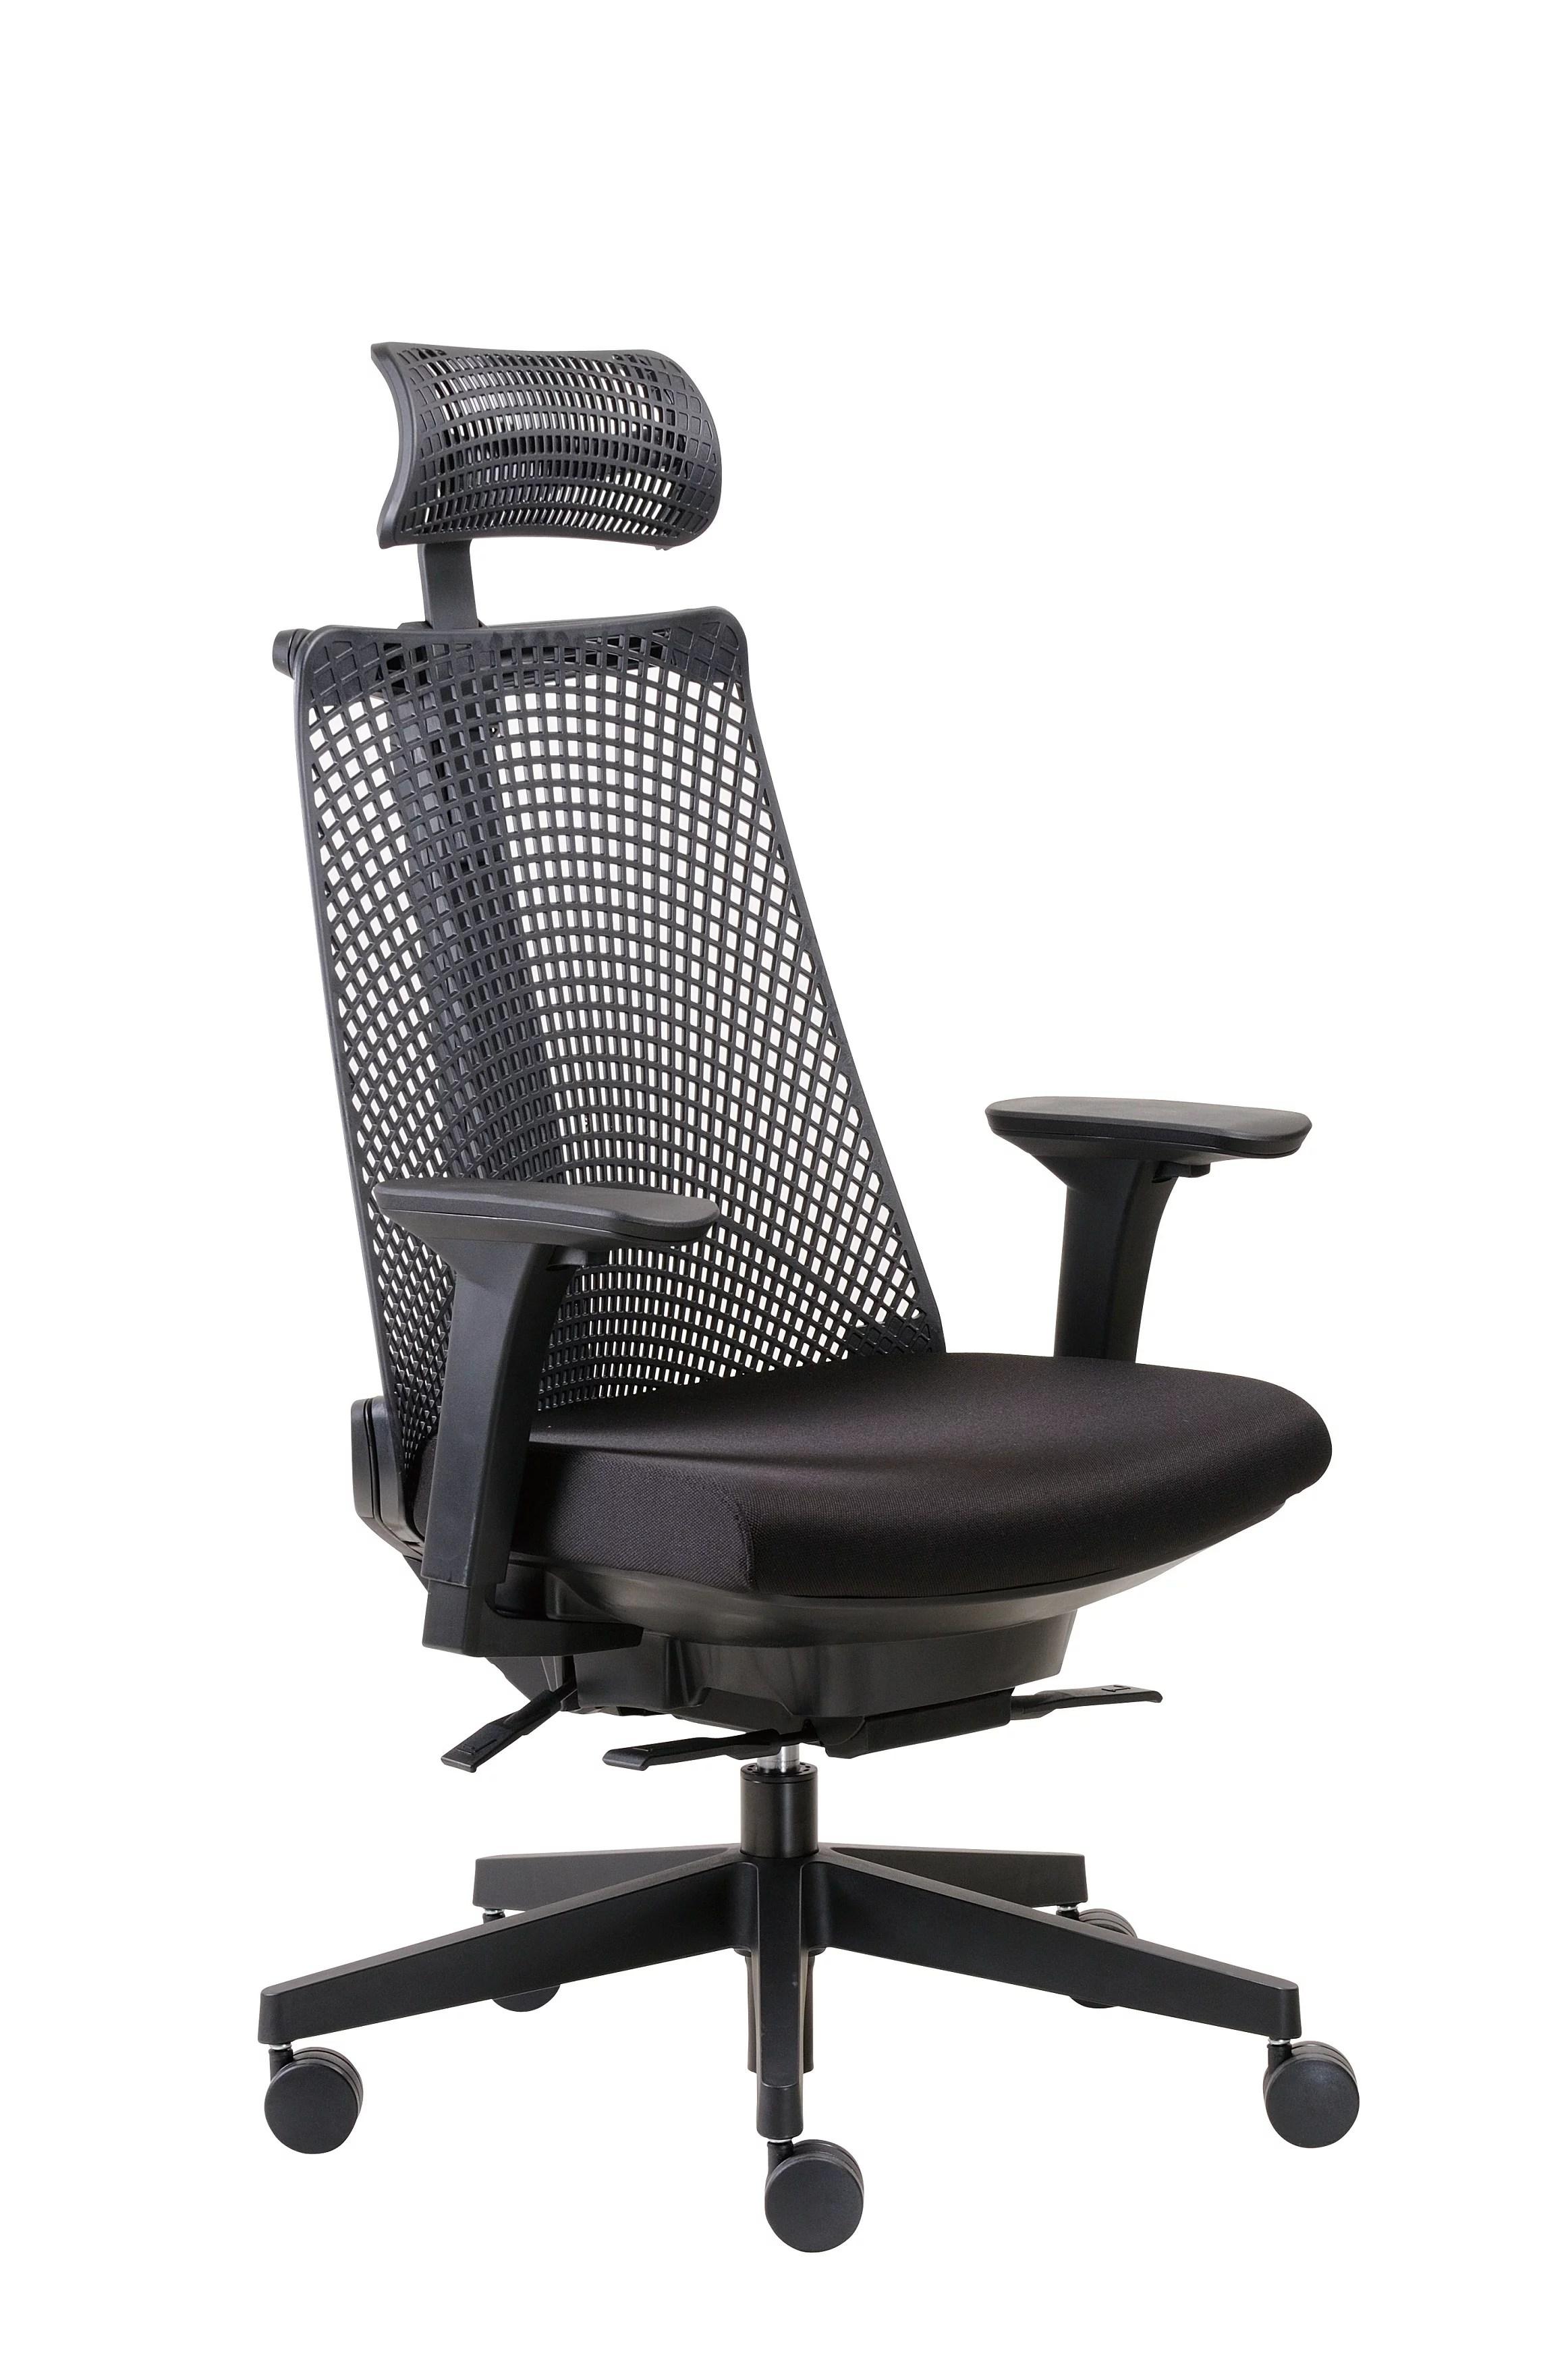 office chair with headrest home depot adirondack boss black contemporary executive walmart com